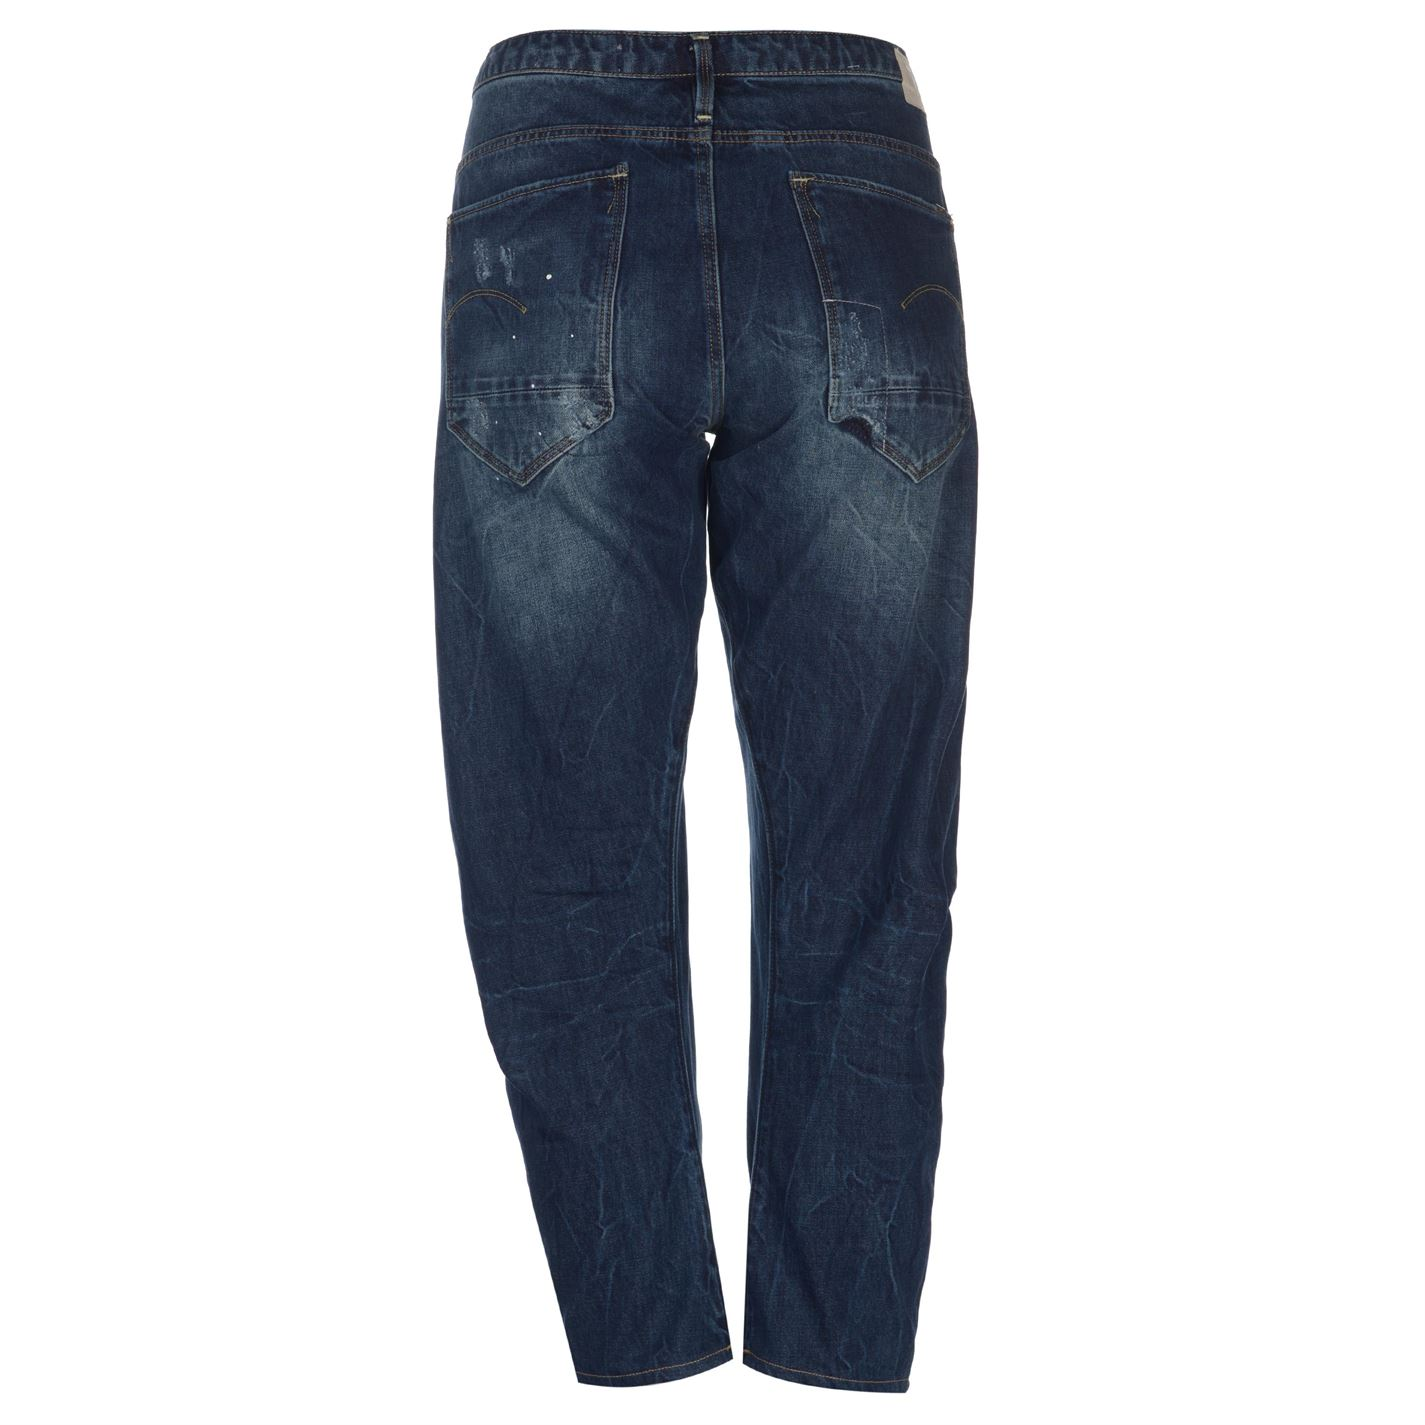 f0ba792e5a3 G Star Womens Arc 3D Button Low Boyfriend Jeans Straight Pants ...